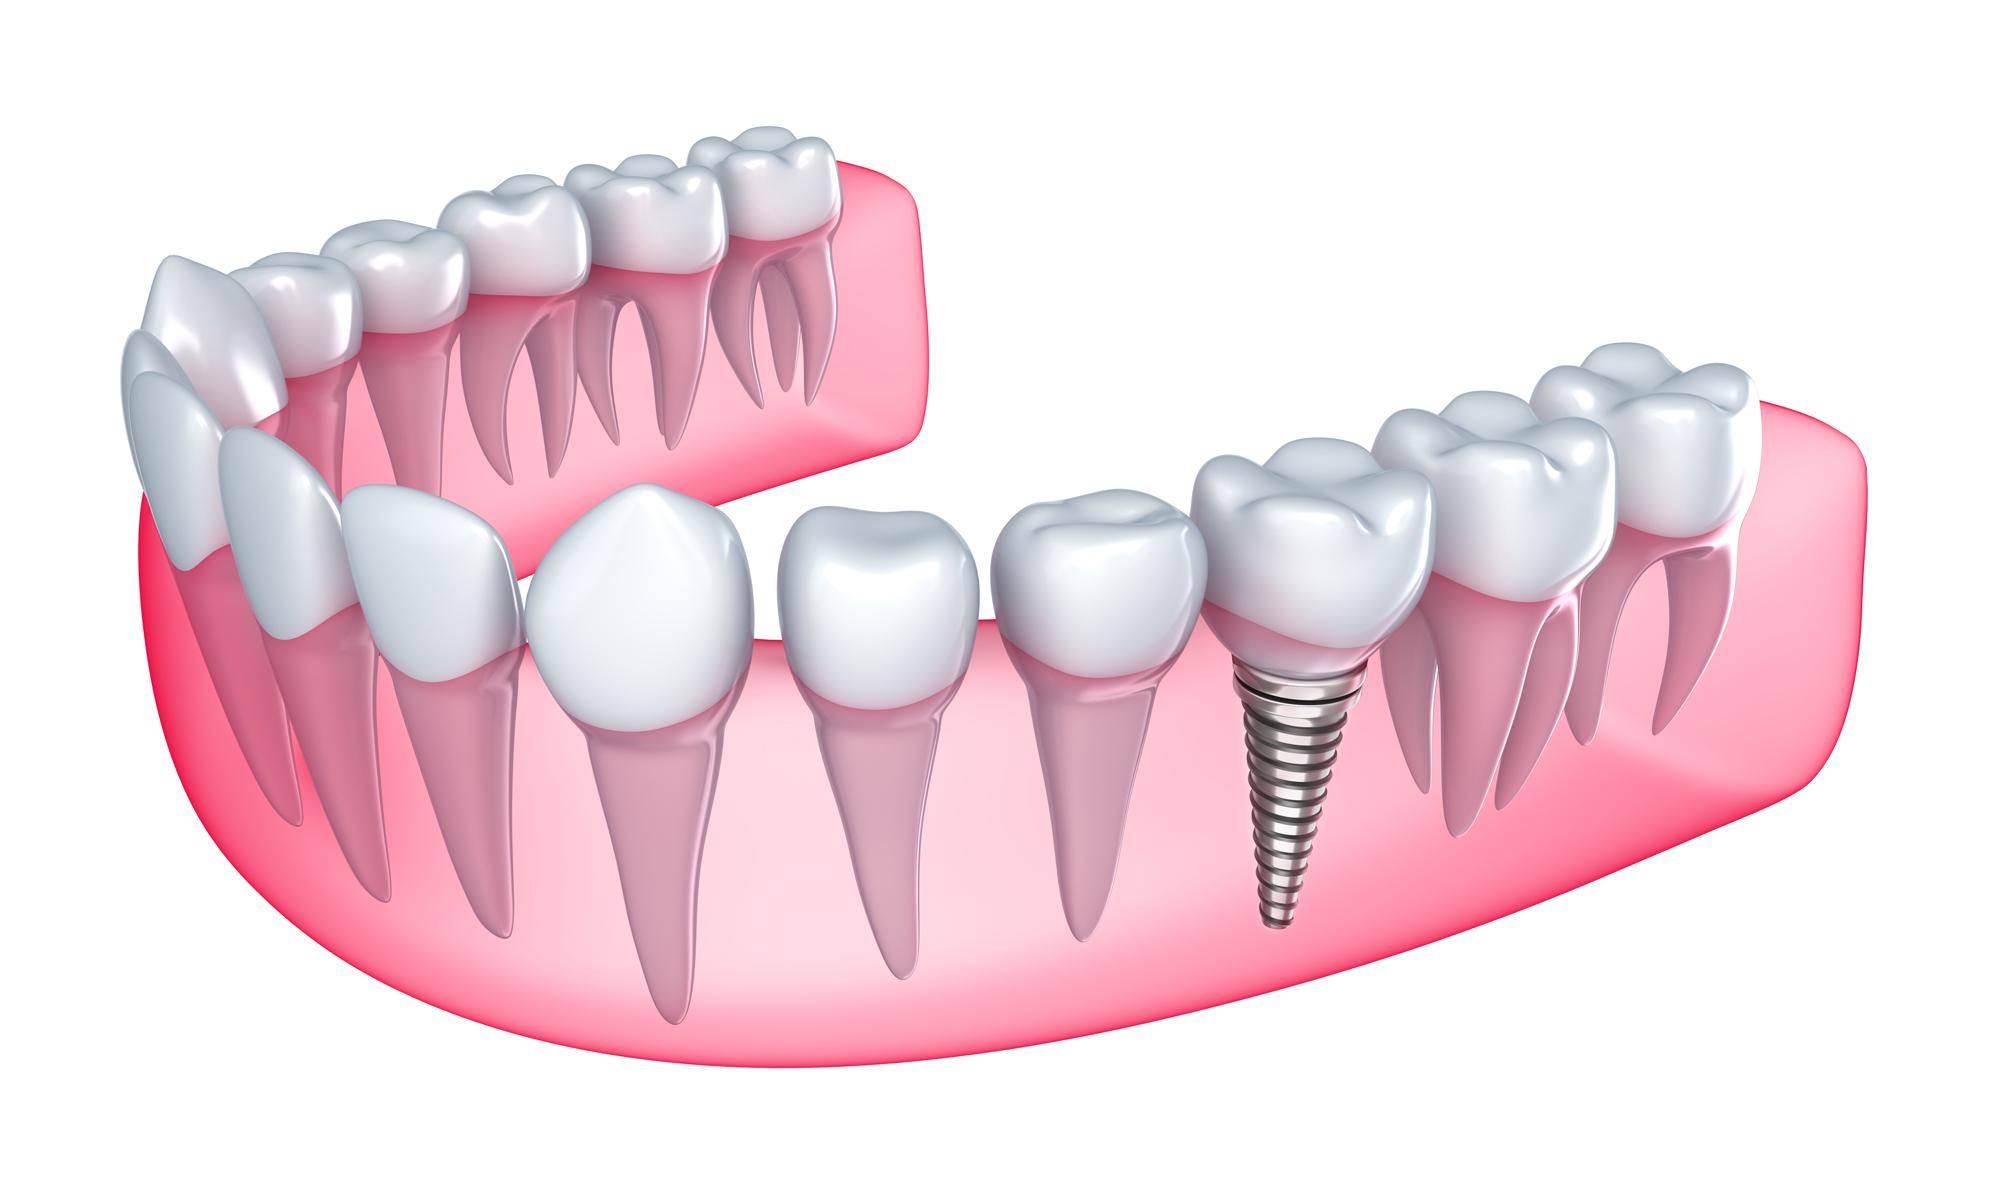 http://clinicascume.com/wp-content/uploads/2016/09/implante.jpg